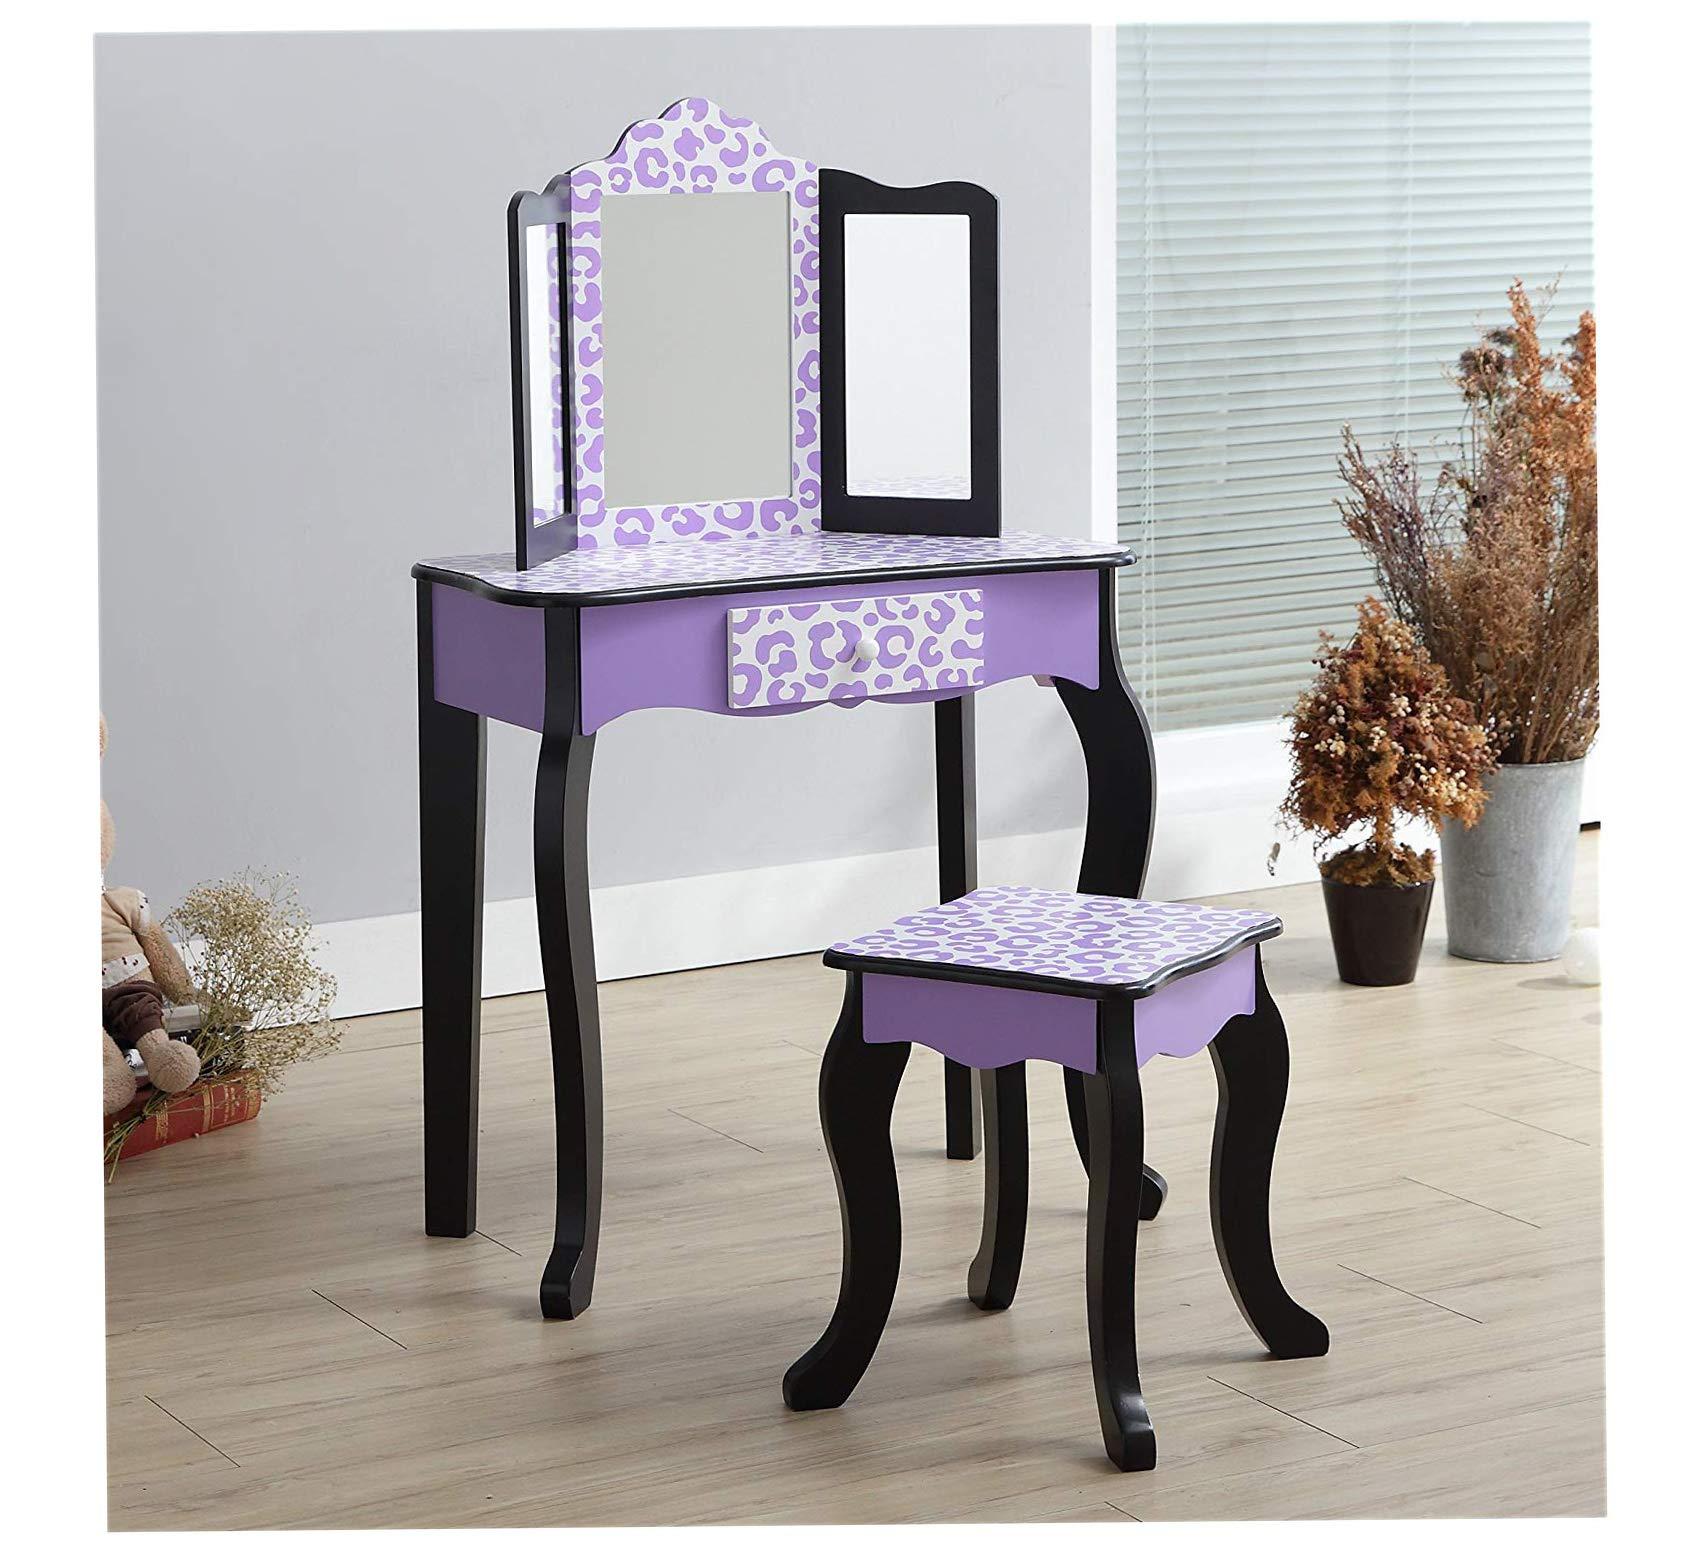 Wood & Style Home Vanity Table & Stool Set, Purple/Black Office Décor Studio Living Heavy Duty Commercial Bar Café Restaurant by Wood & Style